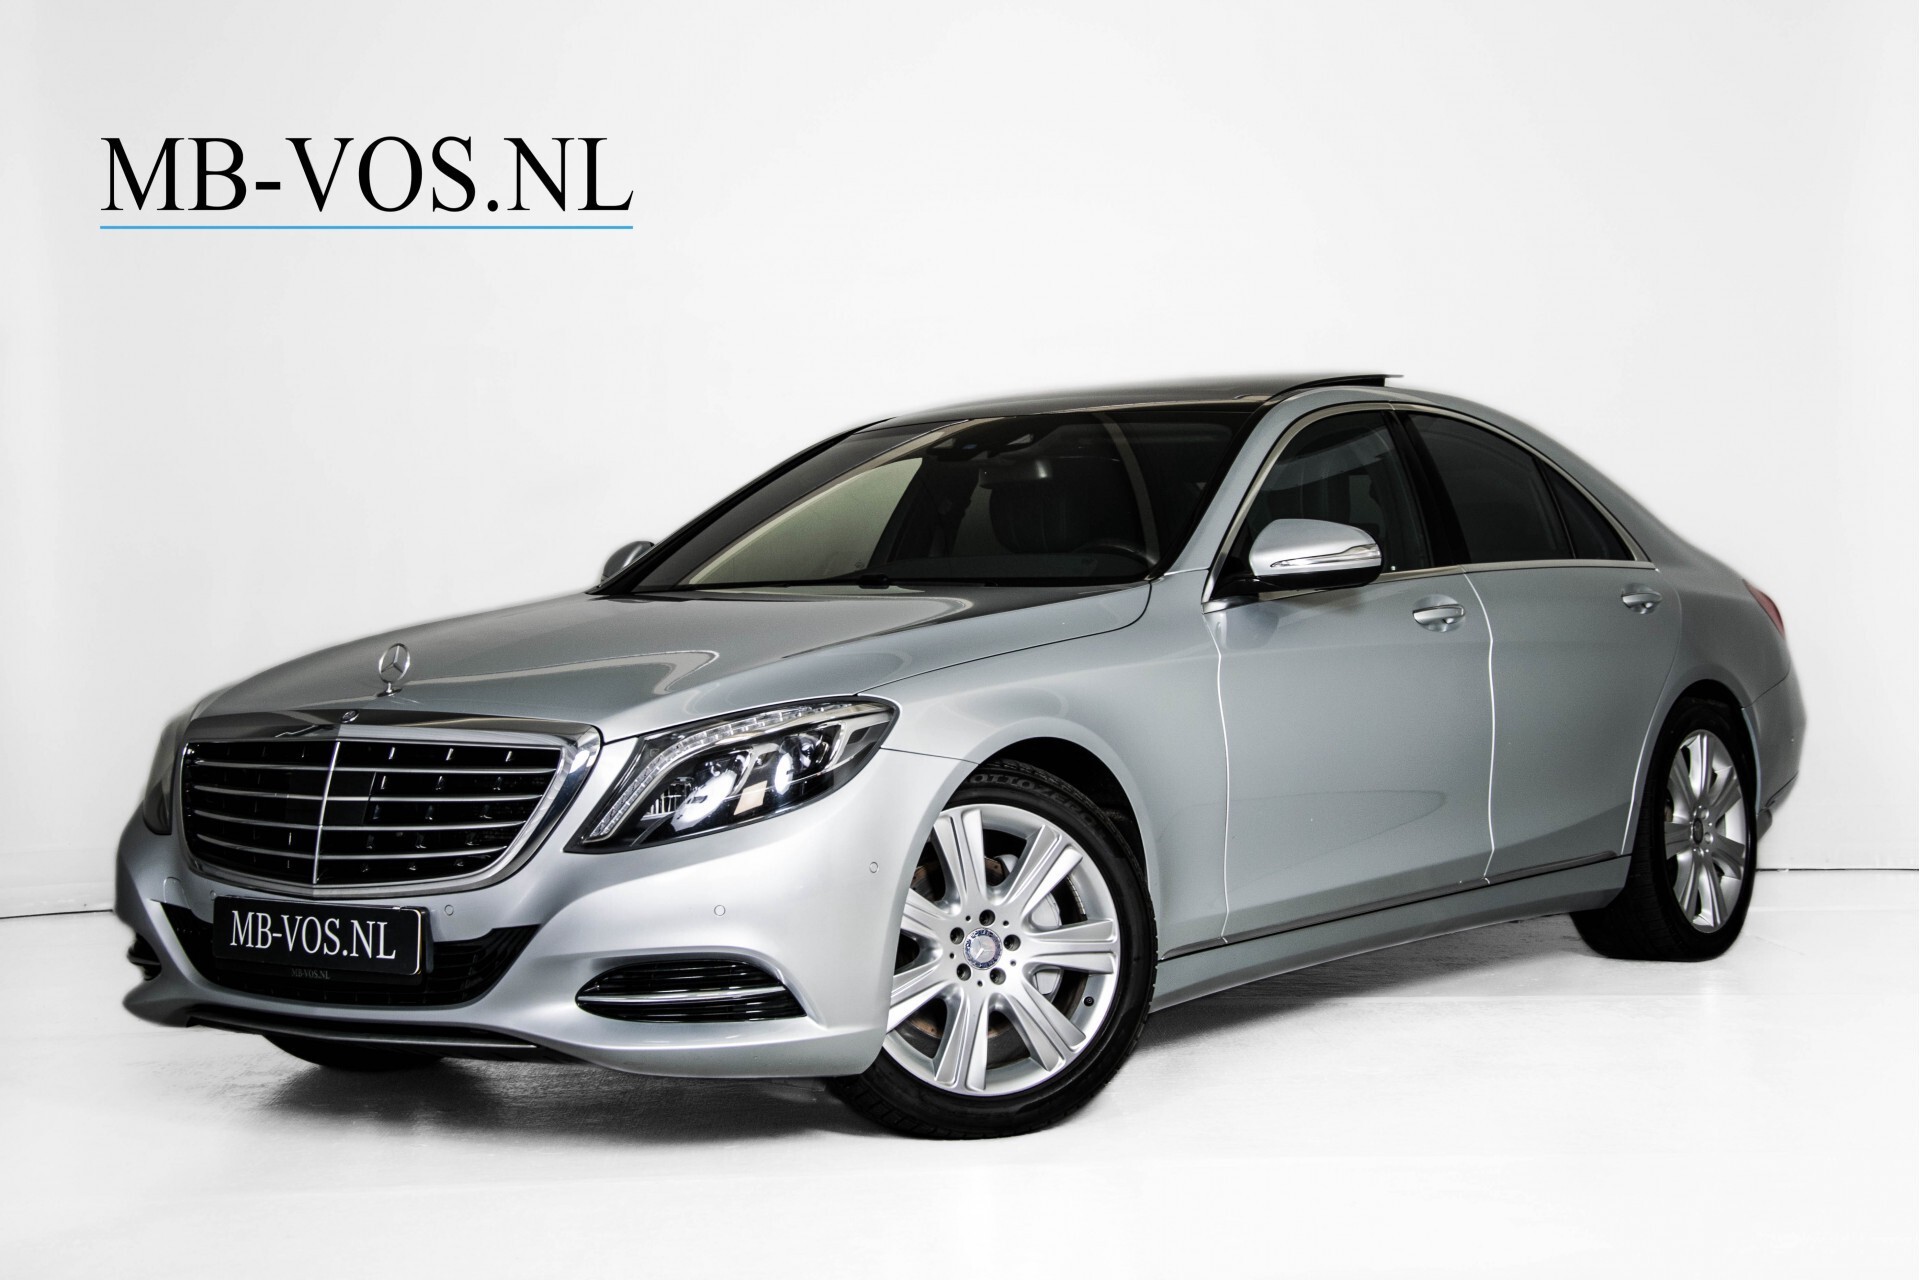 Mercedes-Benz S-Klasse 350 Bluetec Exclusive Panorama/Massage/Keyless/Distronic/Standkachel Aut7 Foto 1